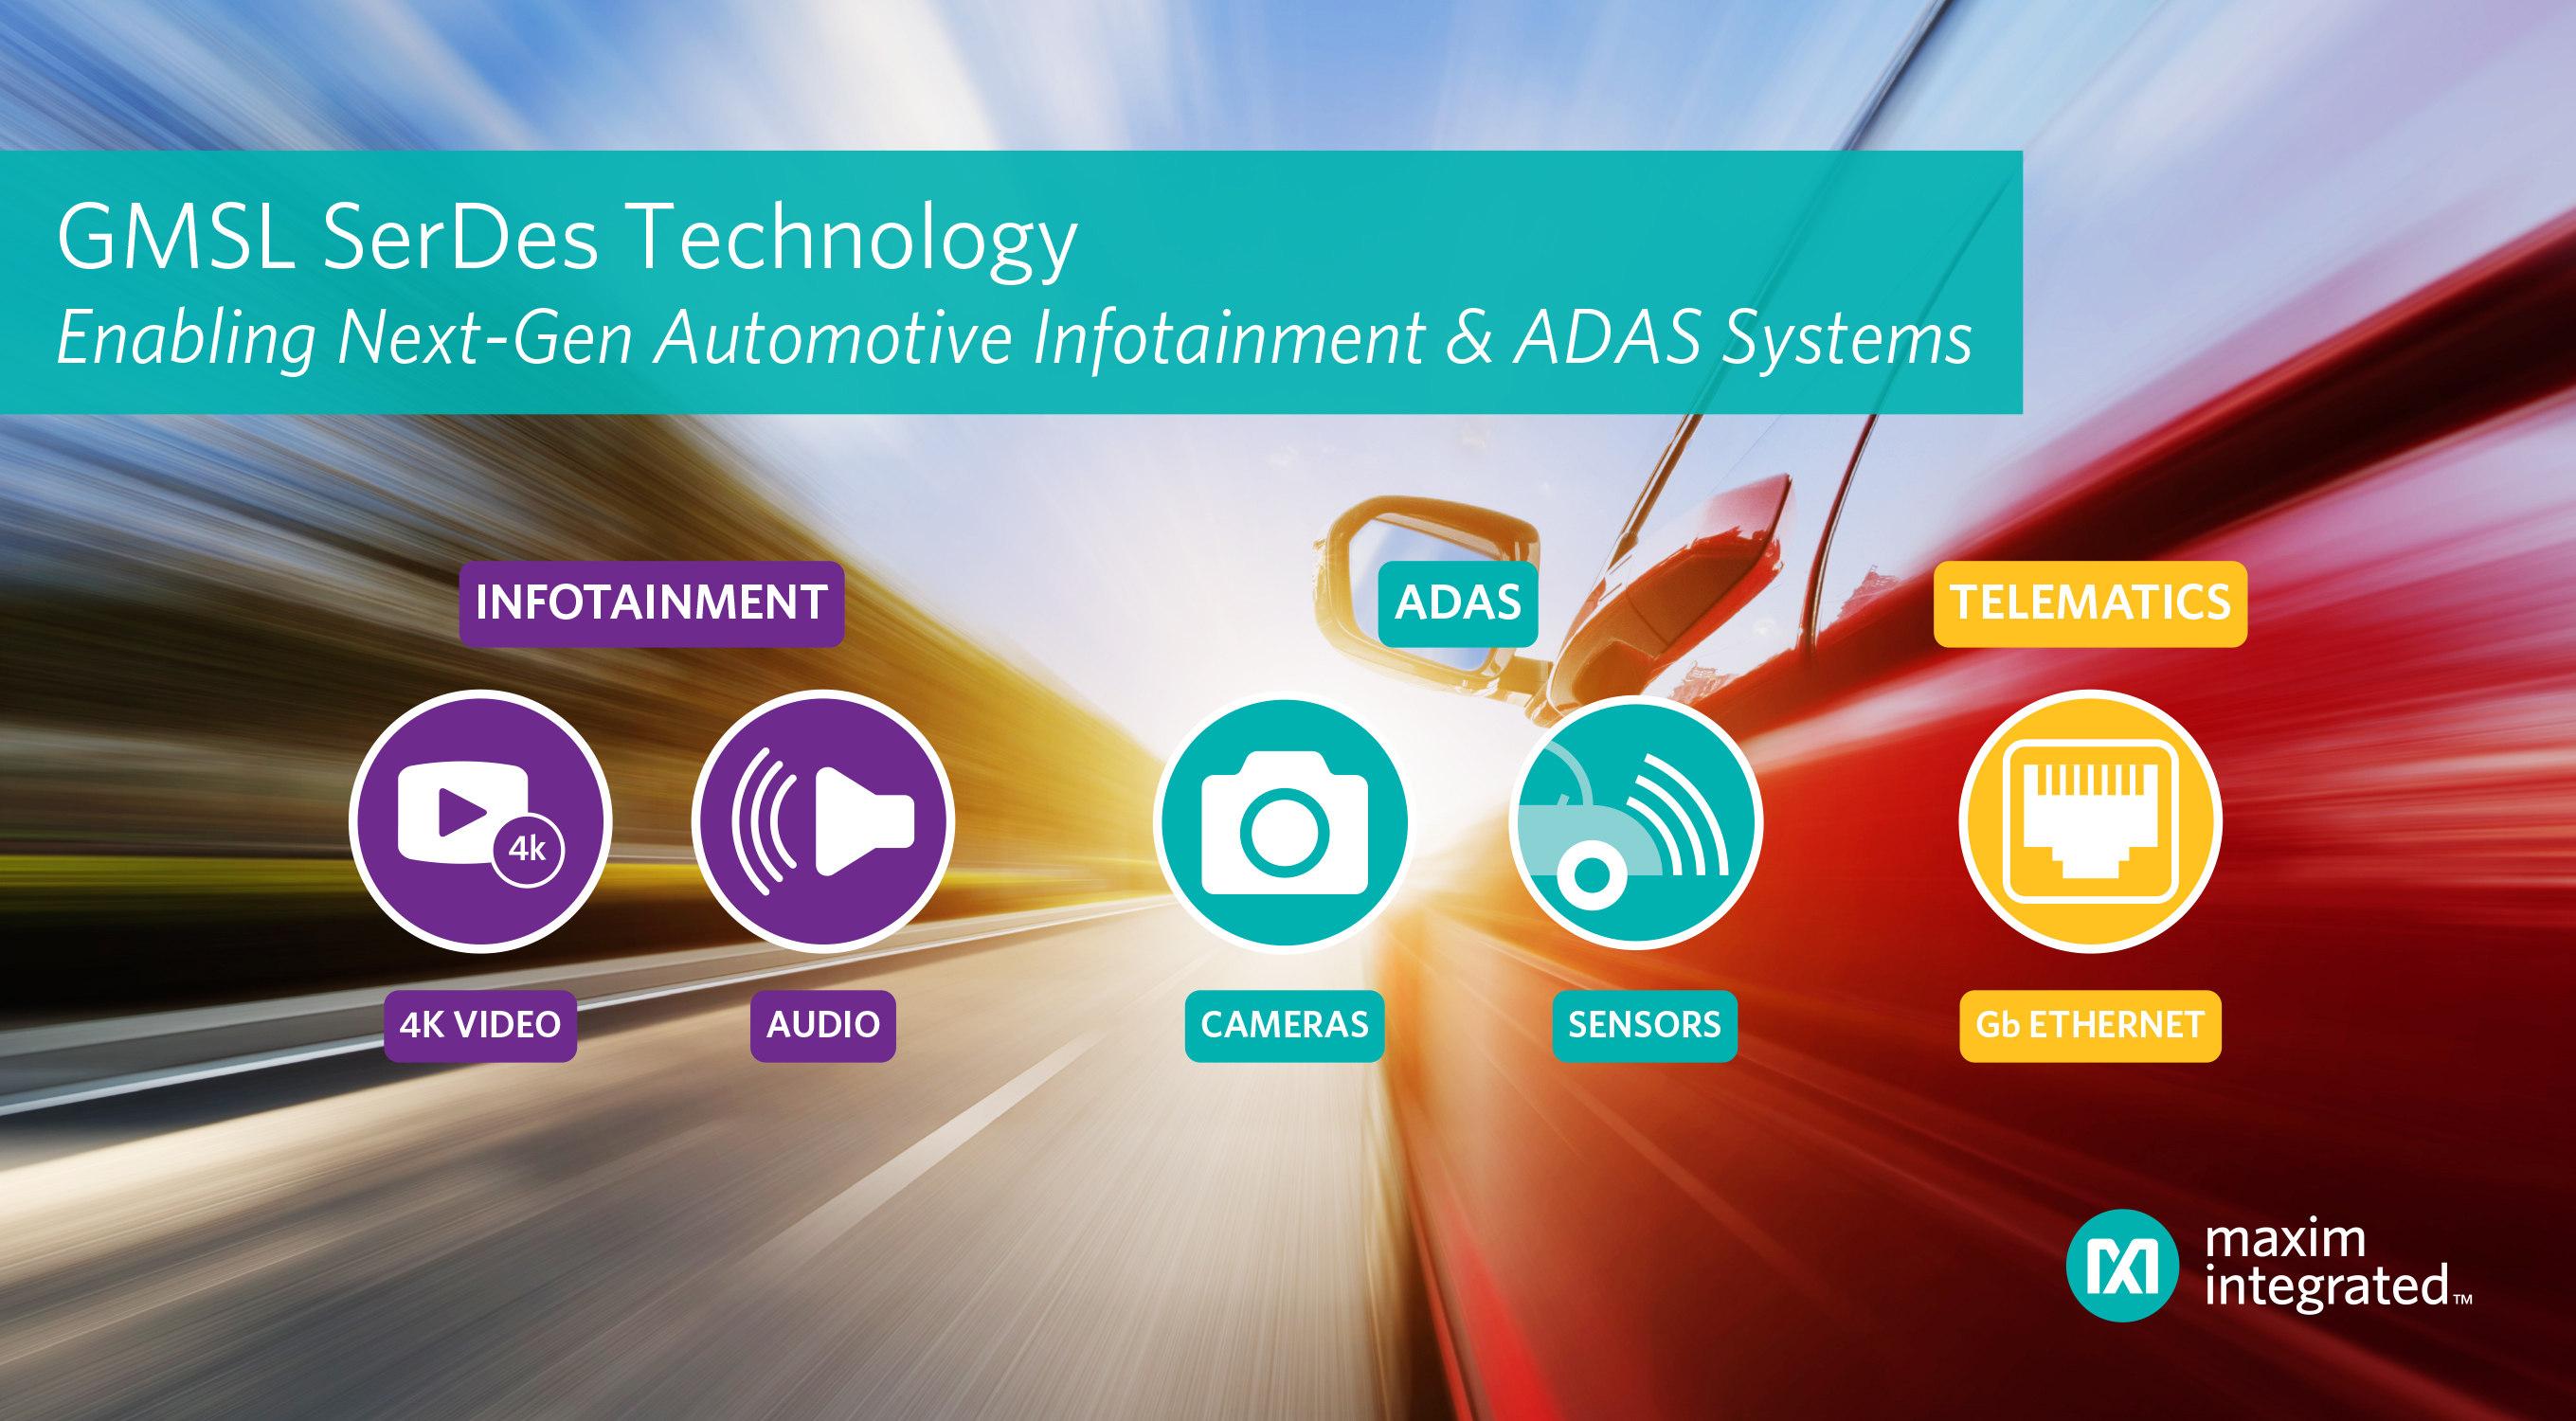 Maxim宣布与NVIDIA在自动驾驶和安全应用领域展开合作